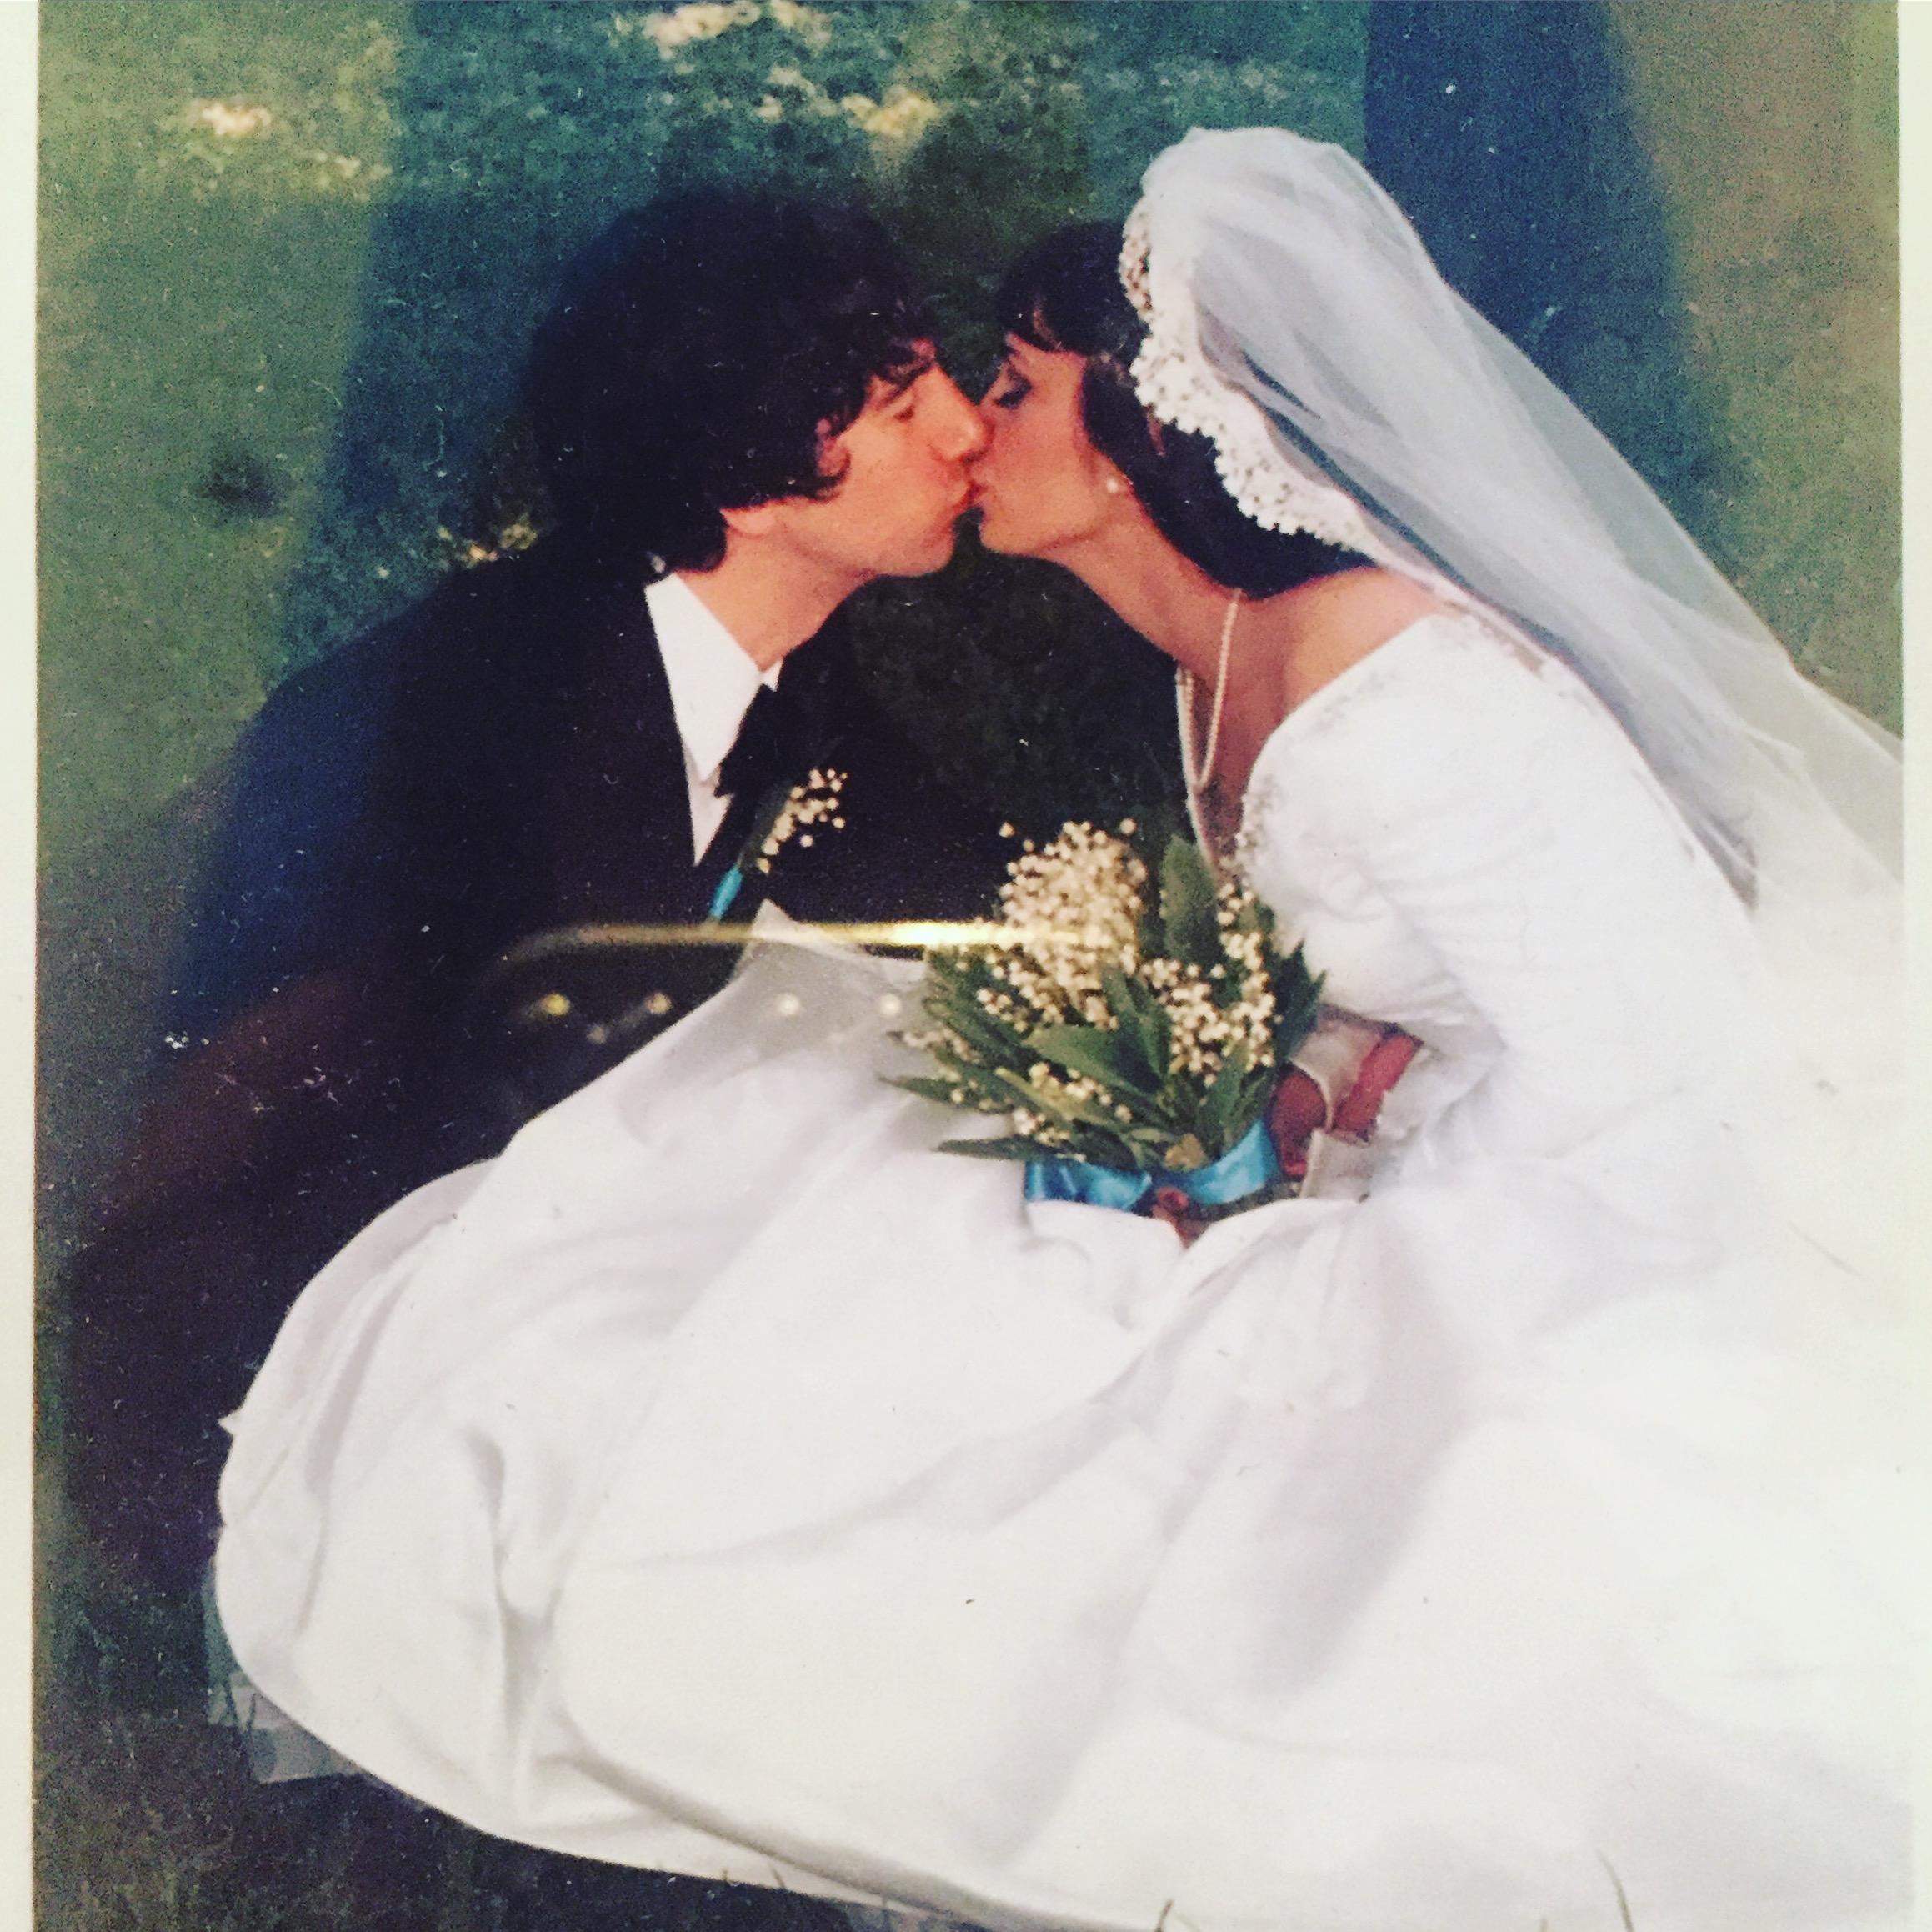 Wedding at Brooklyn Botanical Gardens - Memorial Day, 2006